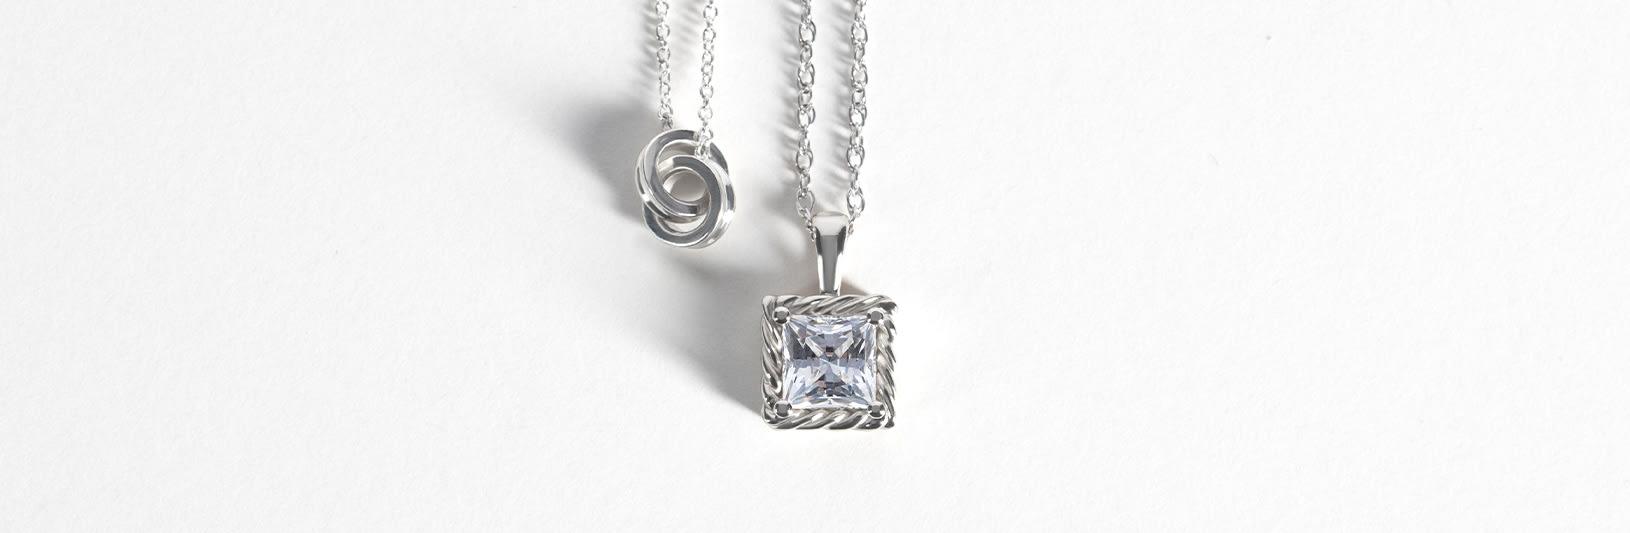 A princess cut simulated diamond pendant